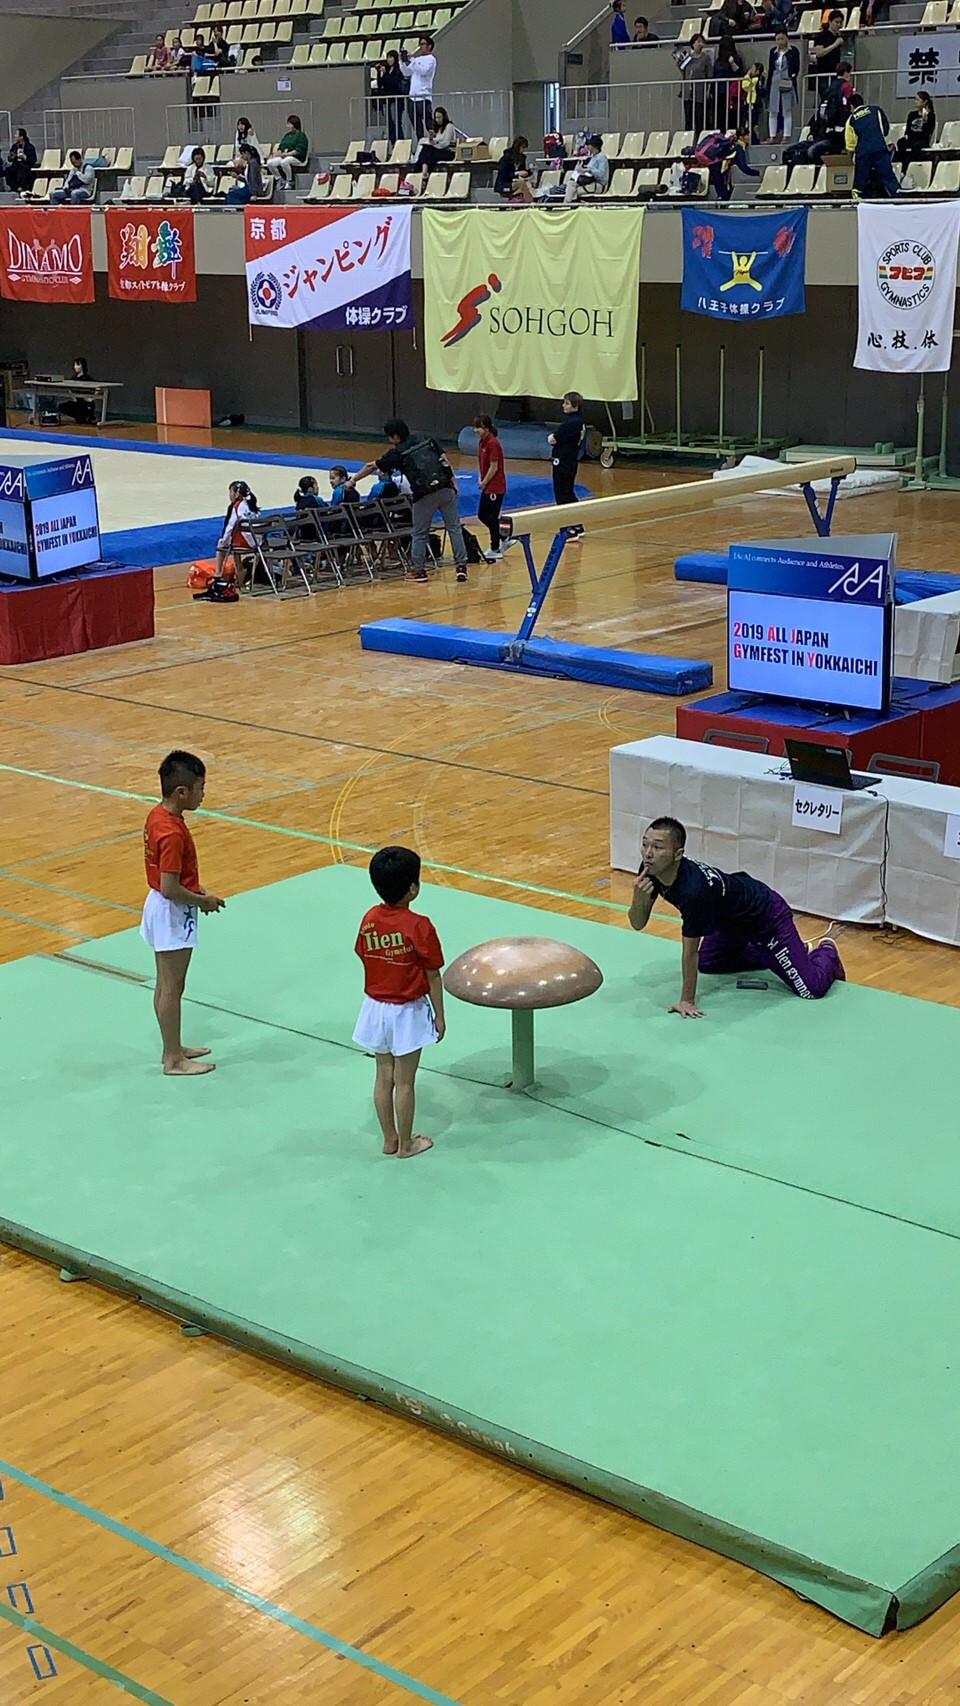 2019年AJG大会in三重県画像26